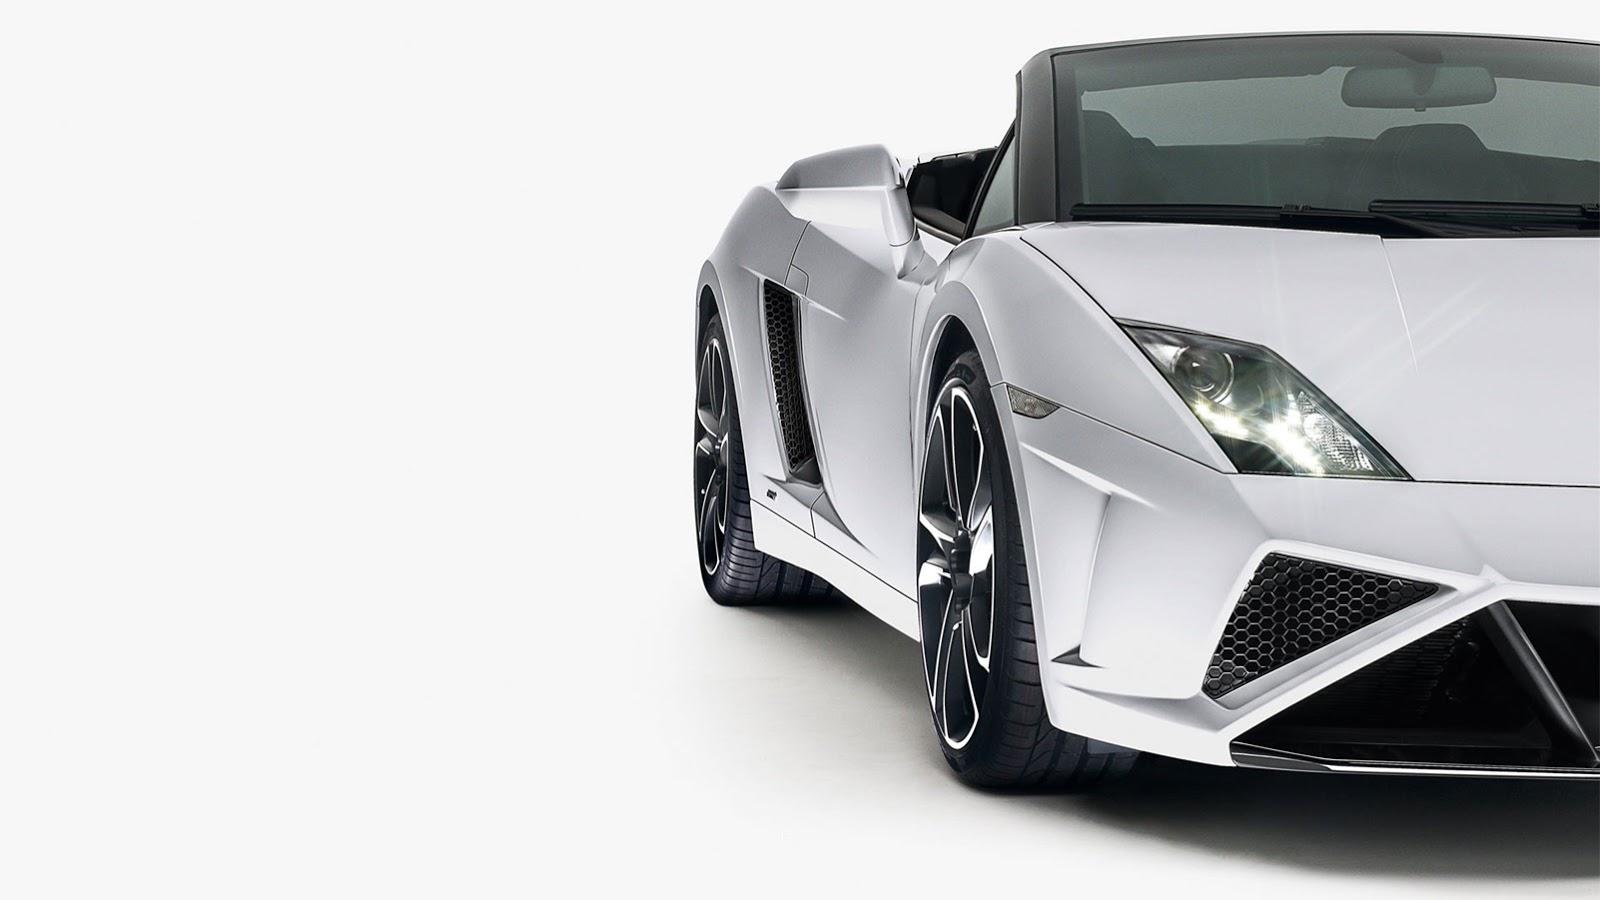 Lamborghini_Gallardo_Spyder_Facelift_Close-Up